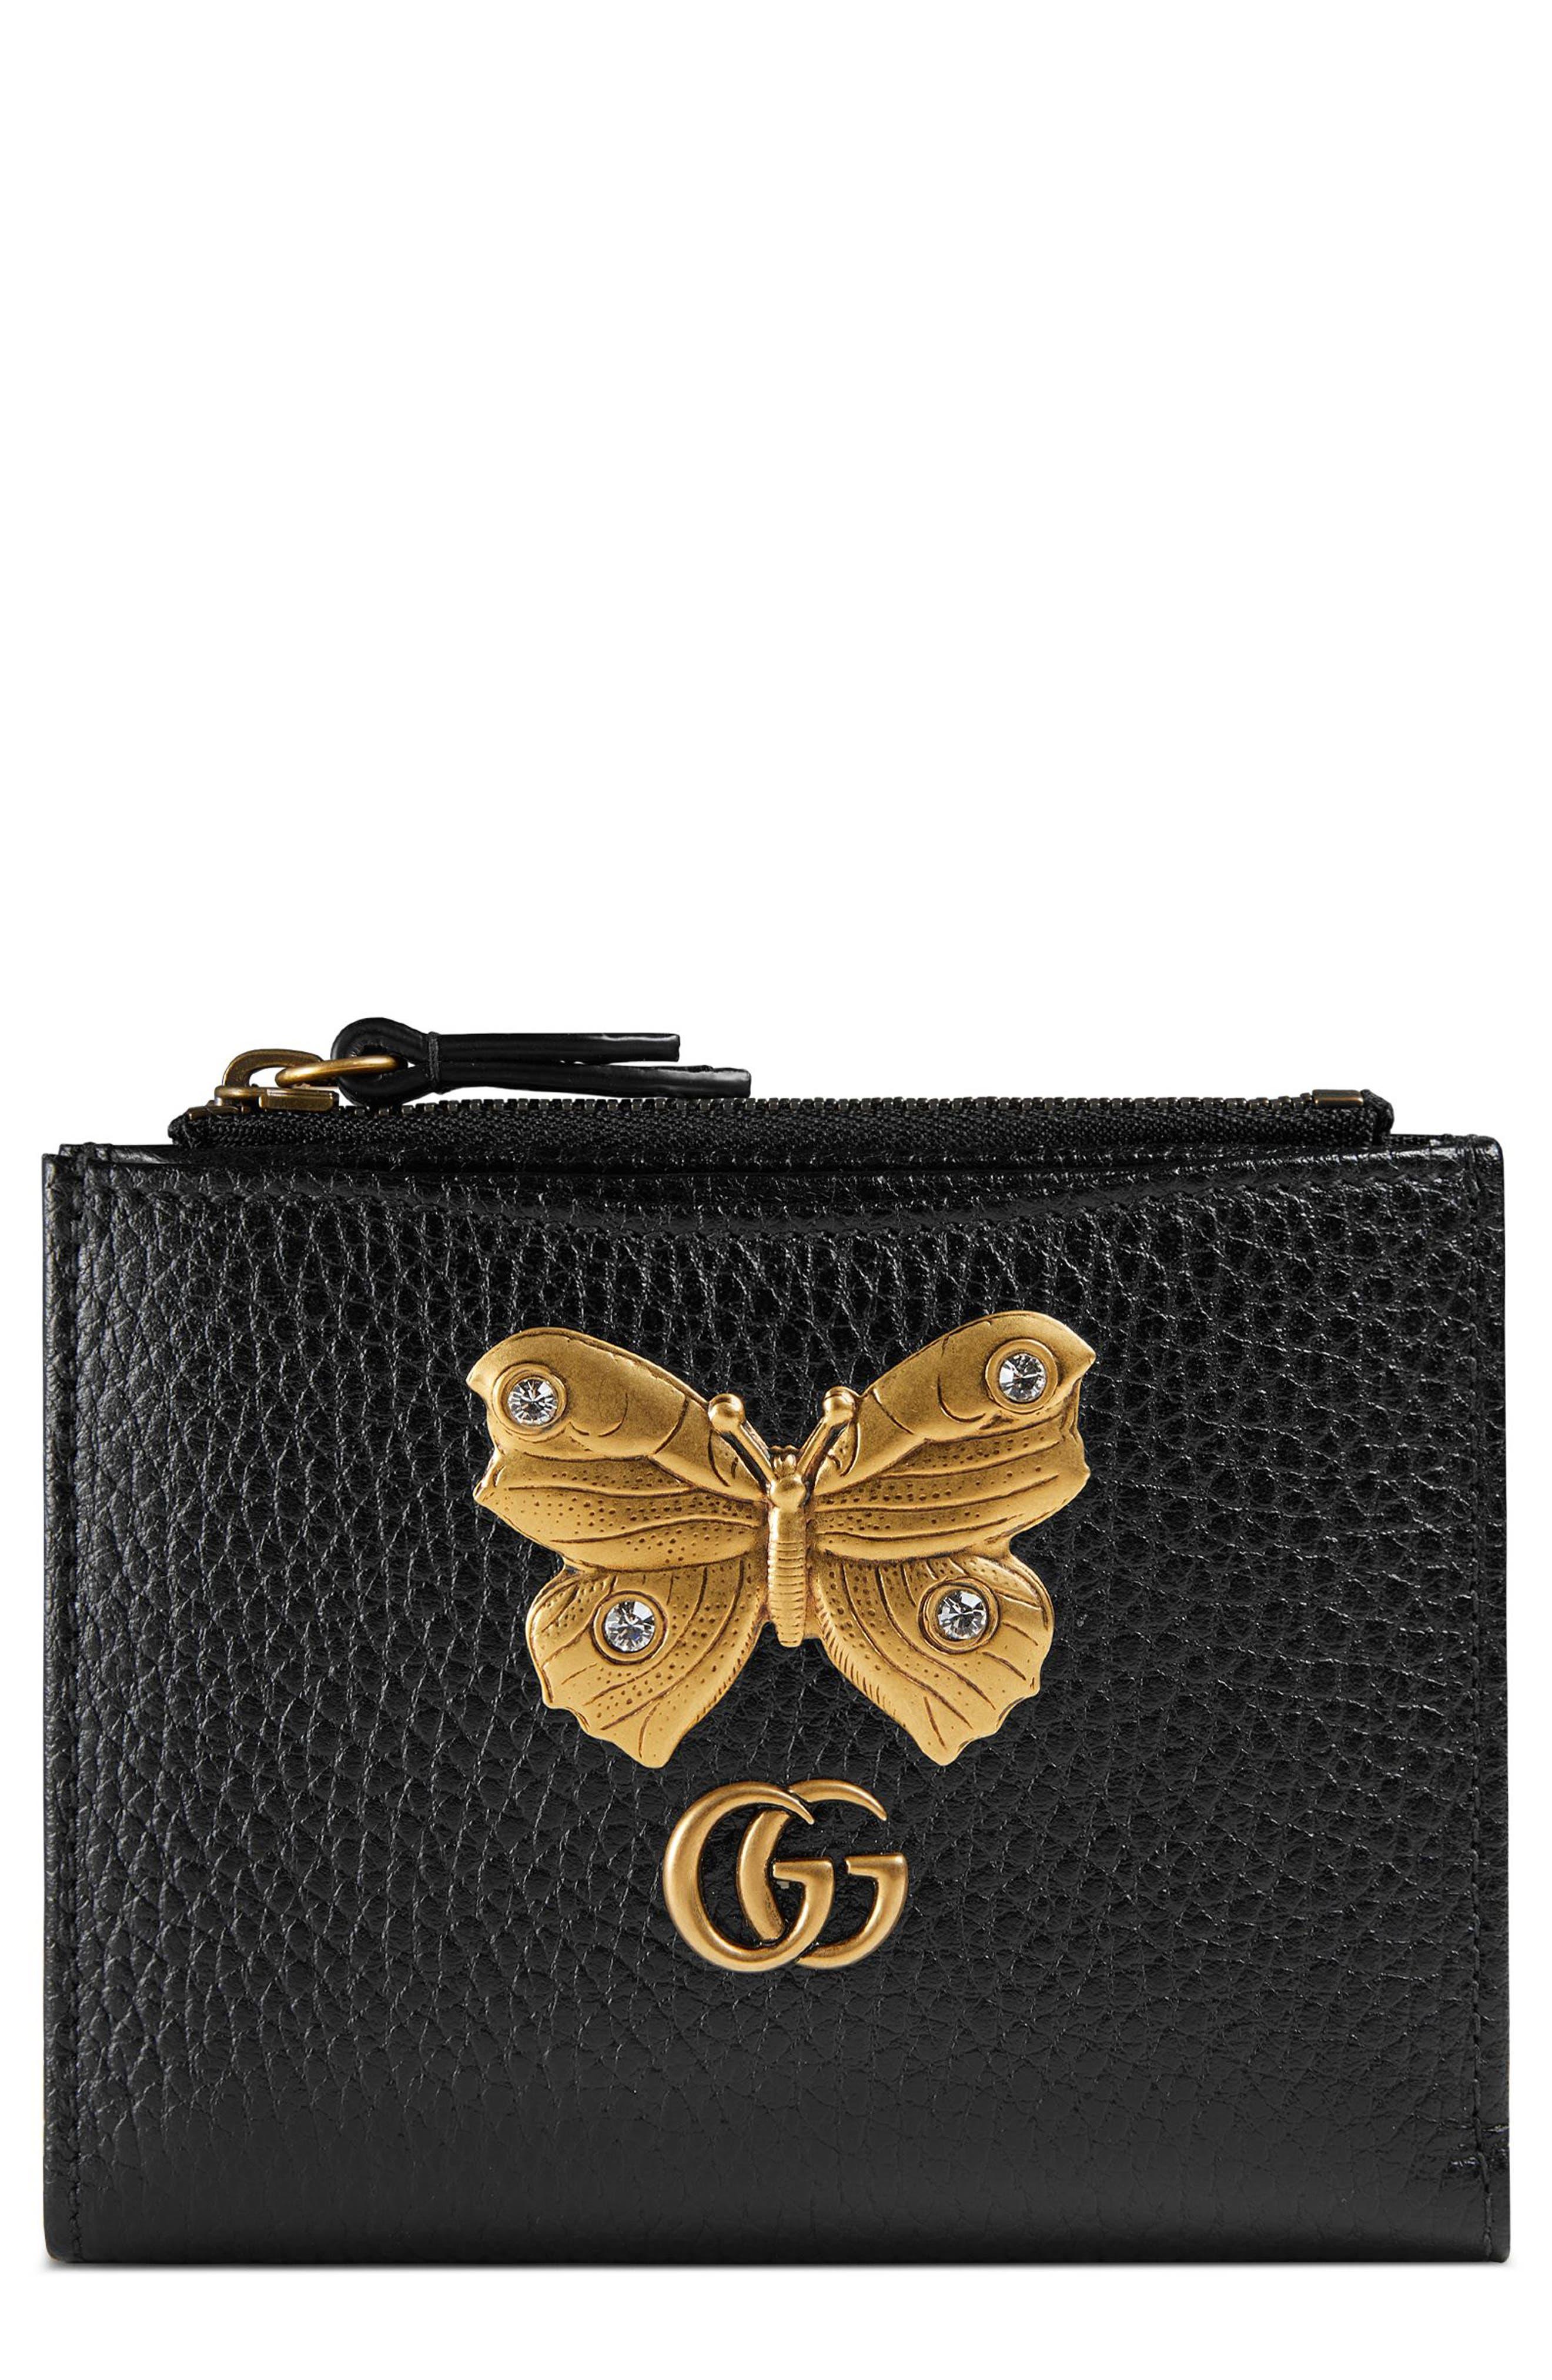 Farfalla Leather Wallet,                             Main thumbnail 1, color,                             NERO/ CRYSTAL